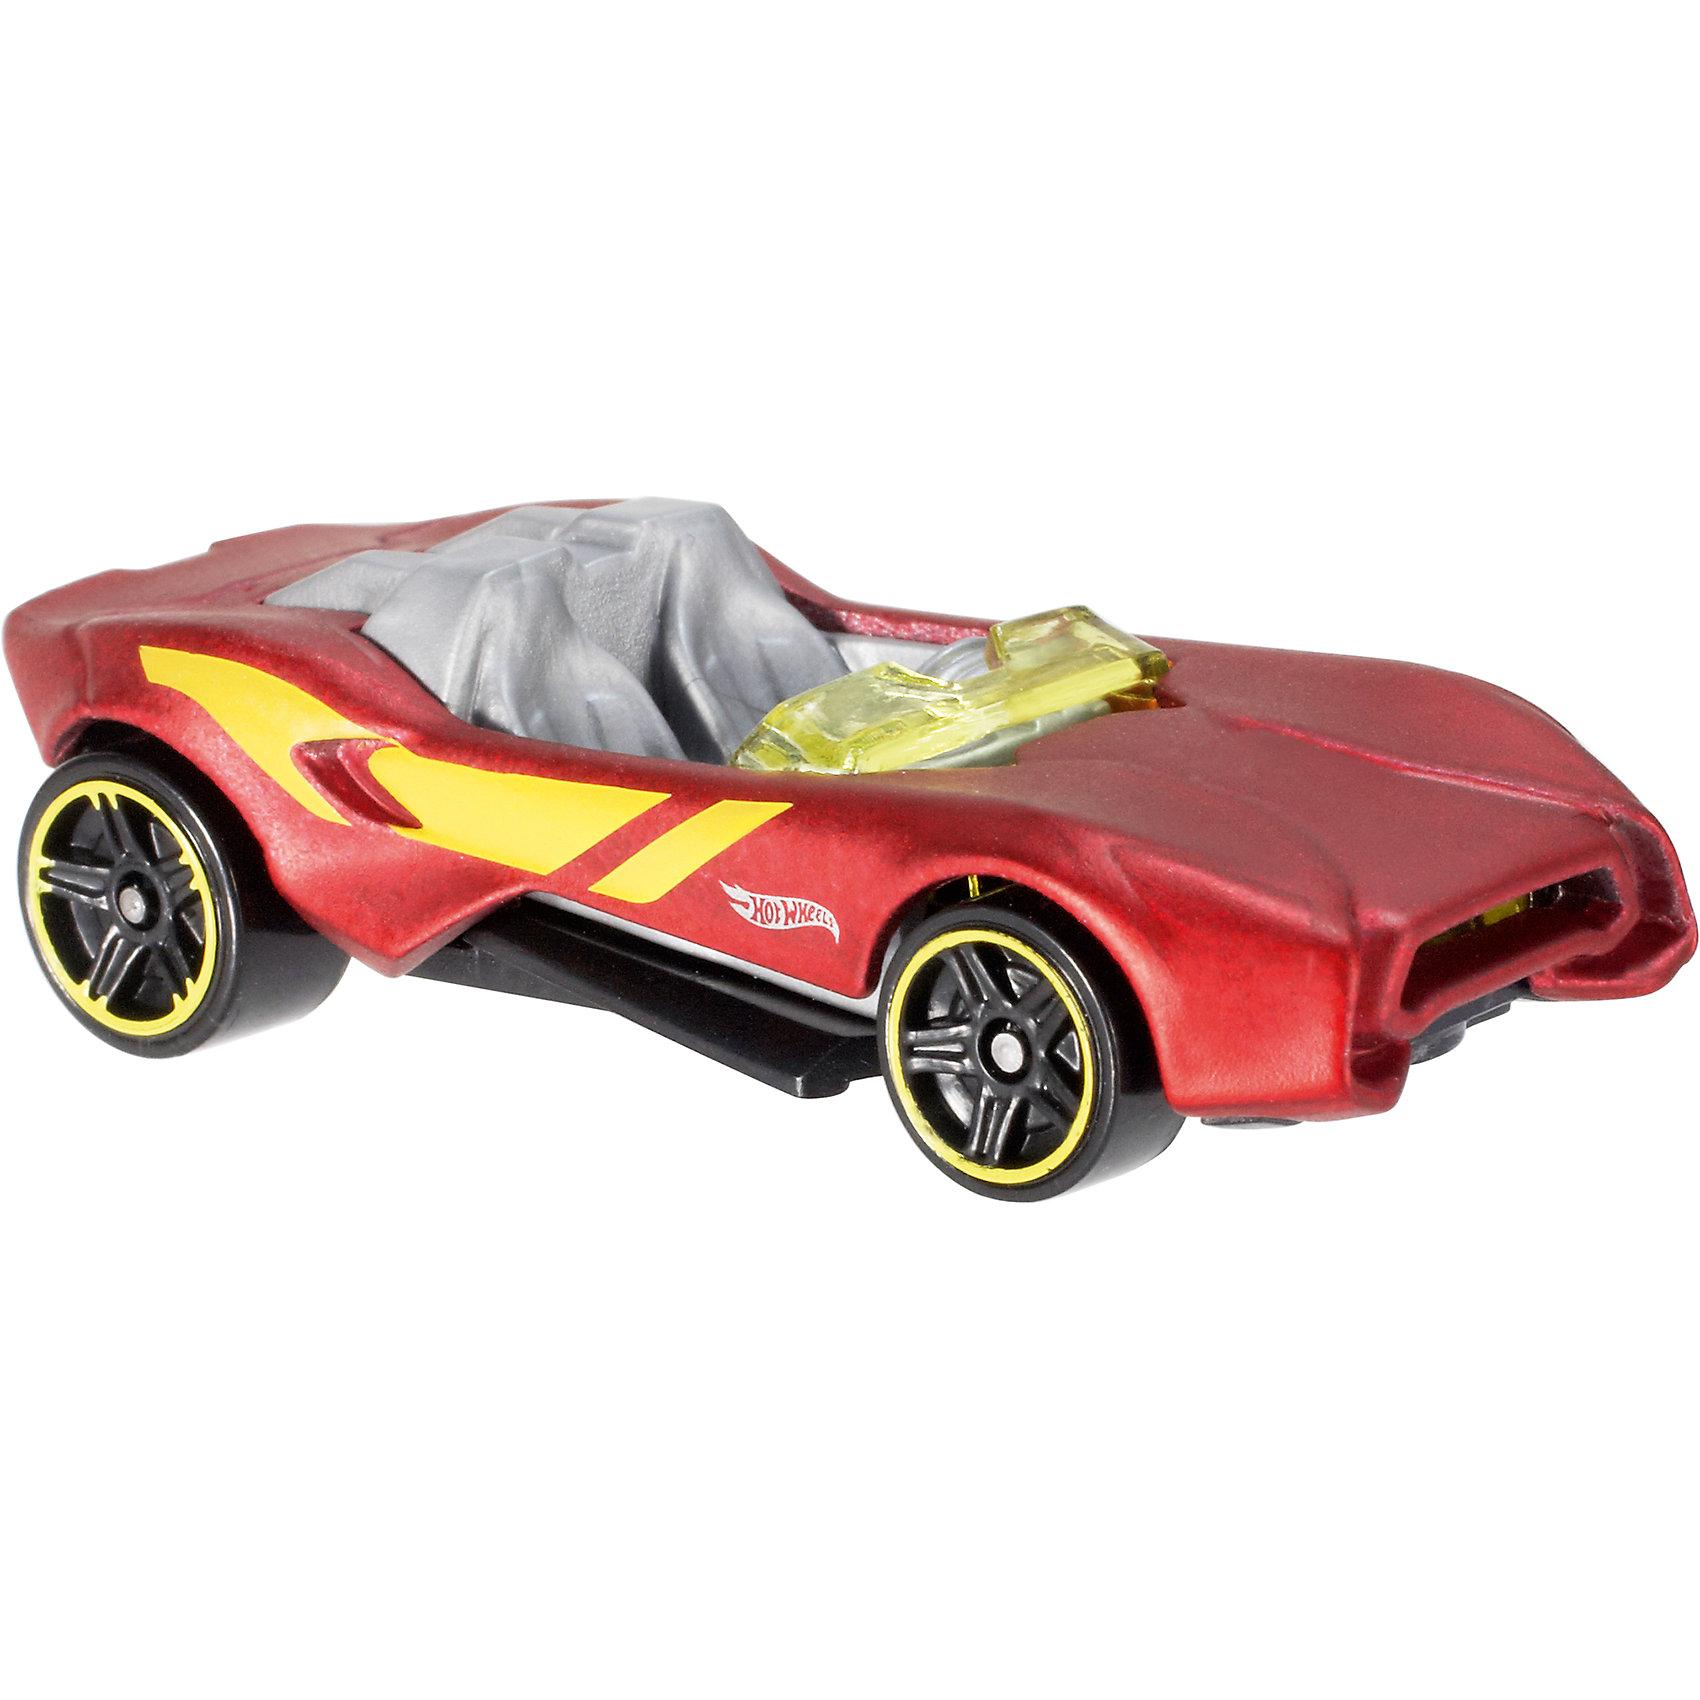 Базовая машинка Hot Wheels, CarbonicПопулярные игрушки<br><br><br>Ширина мм: 110<br>Глубина мм: 45<br>Высота мм: 110<br>Вес г: 30<br>Возраст от месяцев: 36<br>Возраст до месяцев: 96<br>Пол: Мужской<br>Возраст: Детский<br>SKU: 7111908